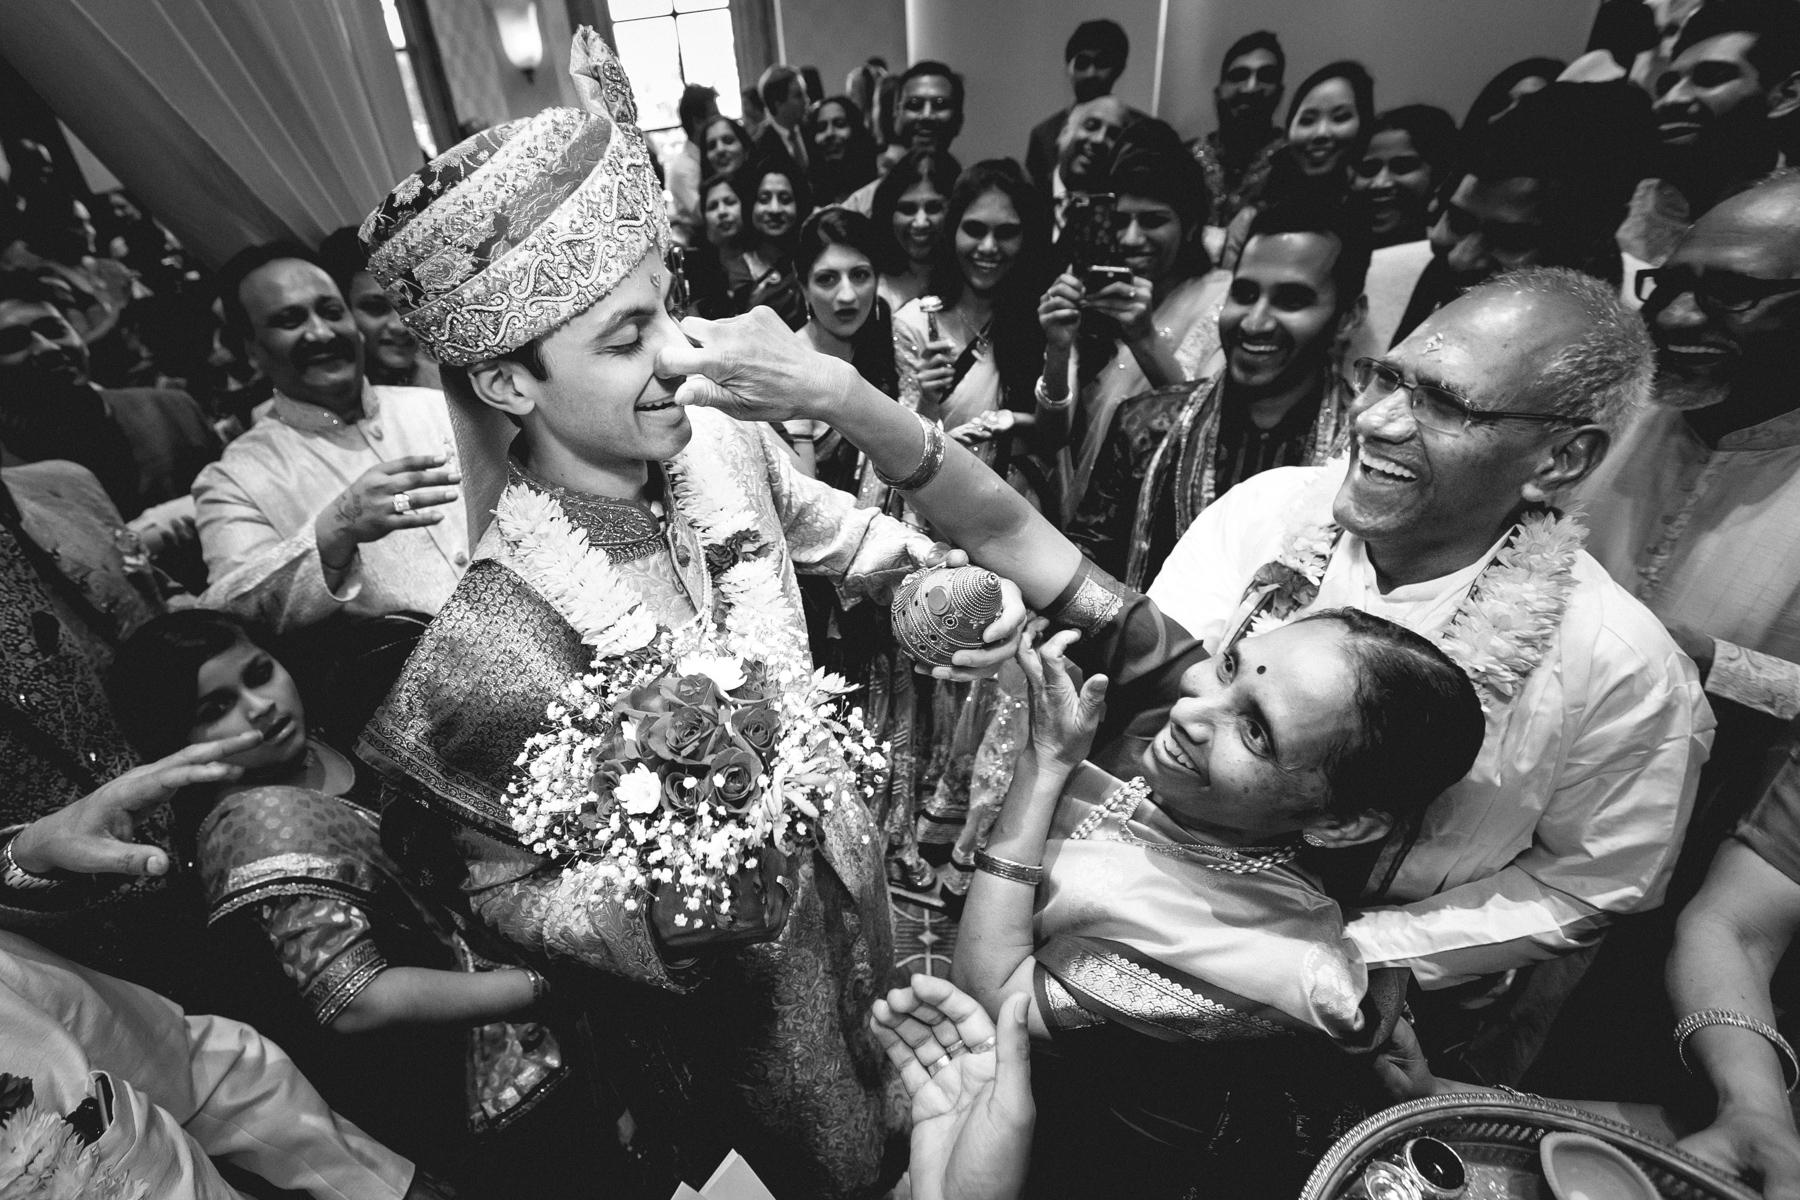 edward-b-photography-indian-wedding-7.jpg